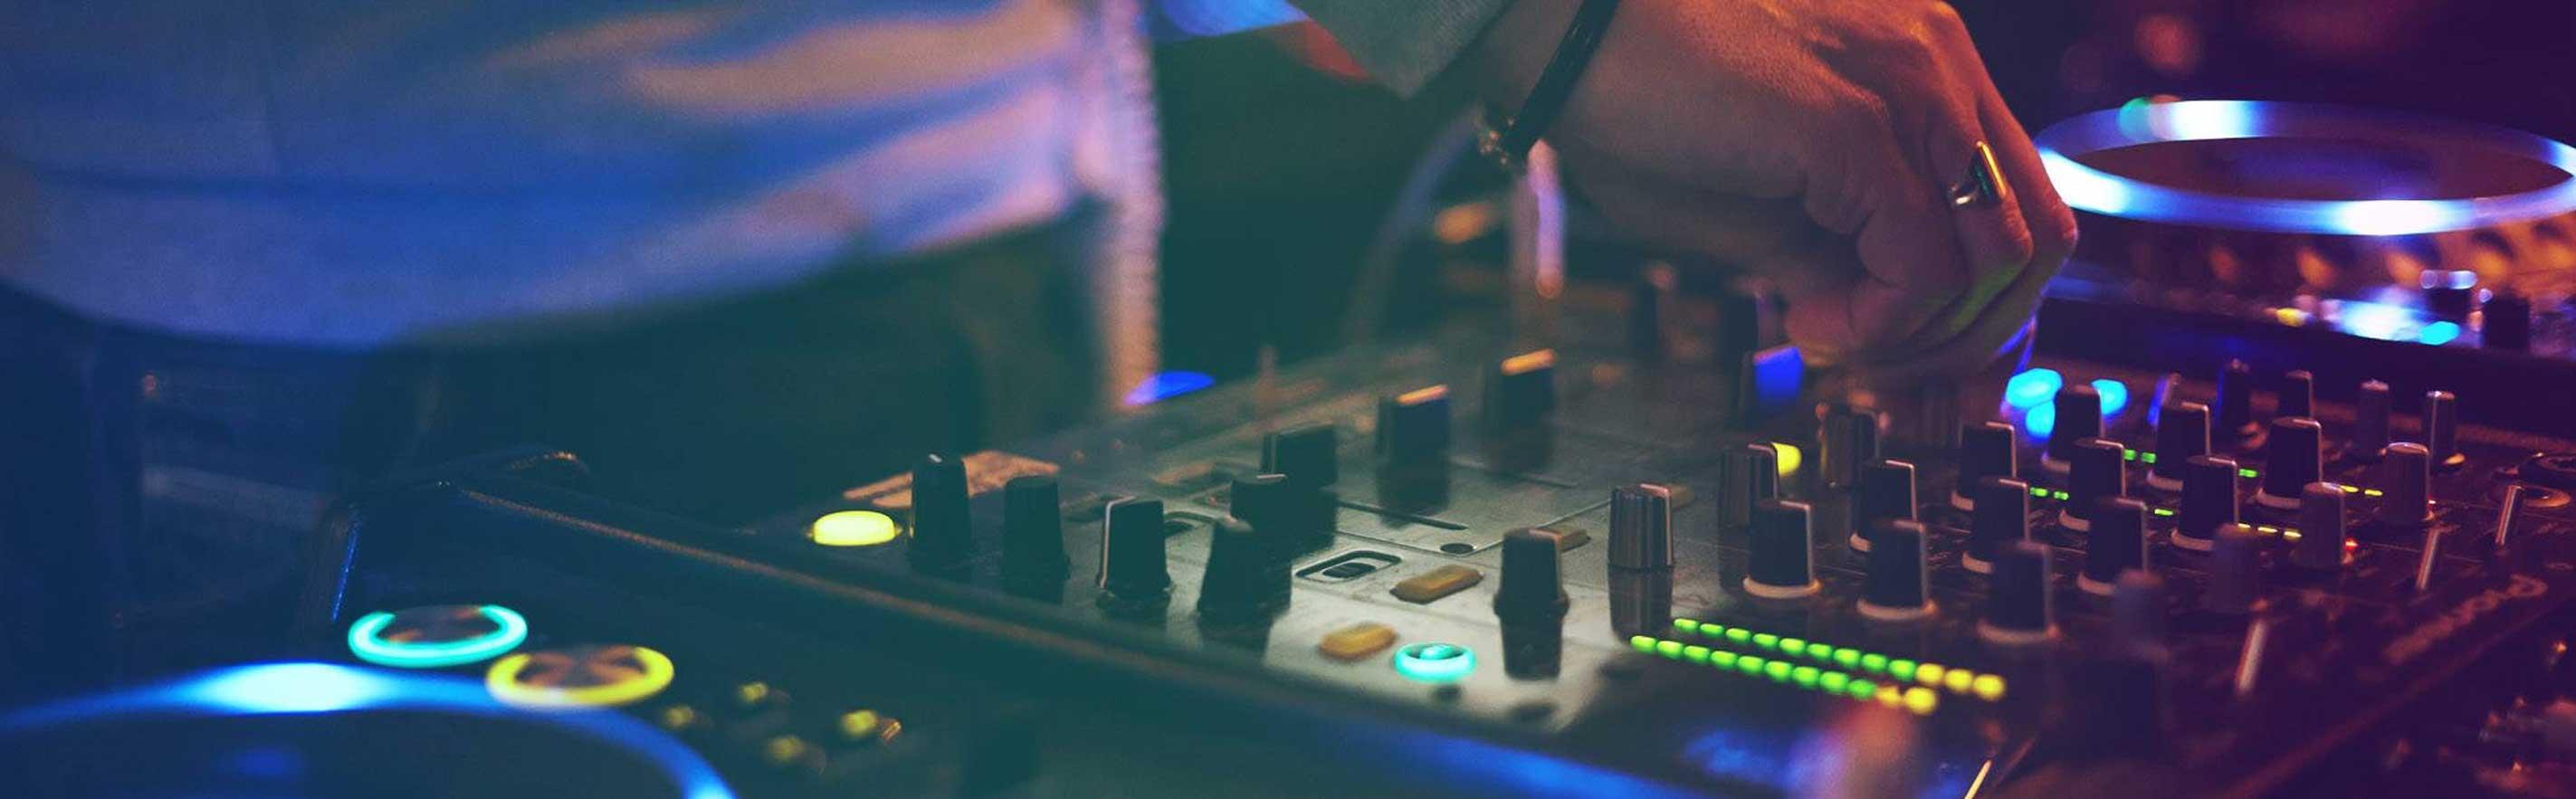 city sound project